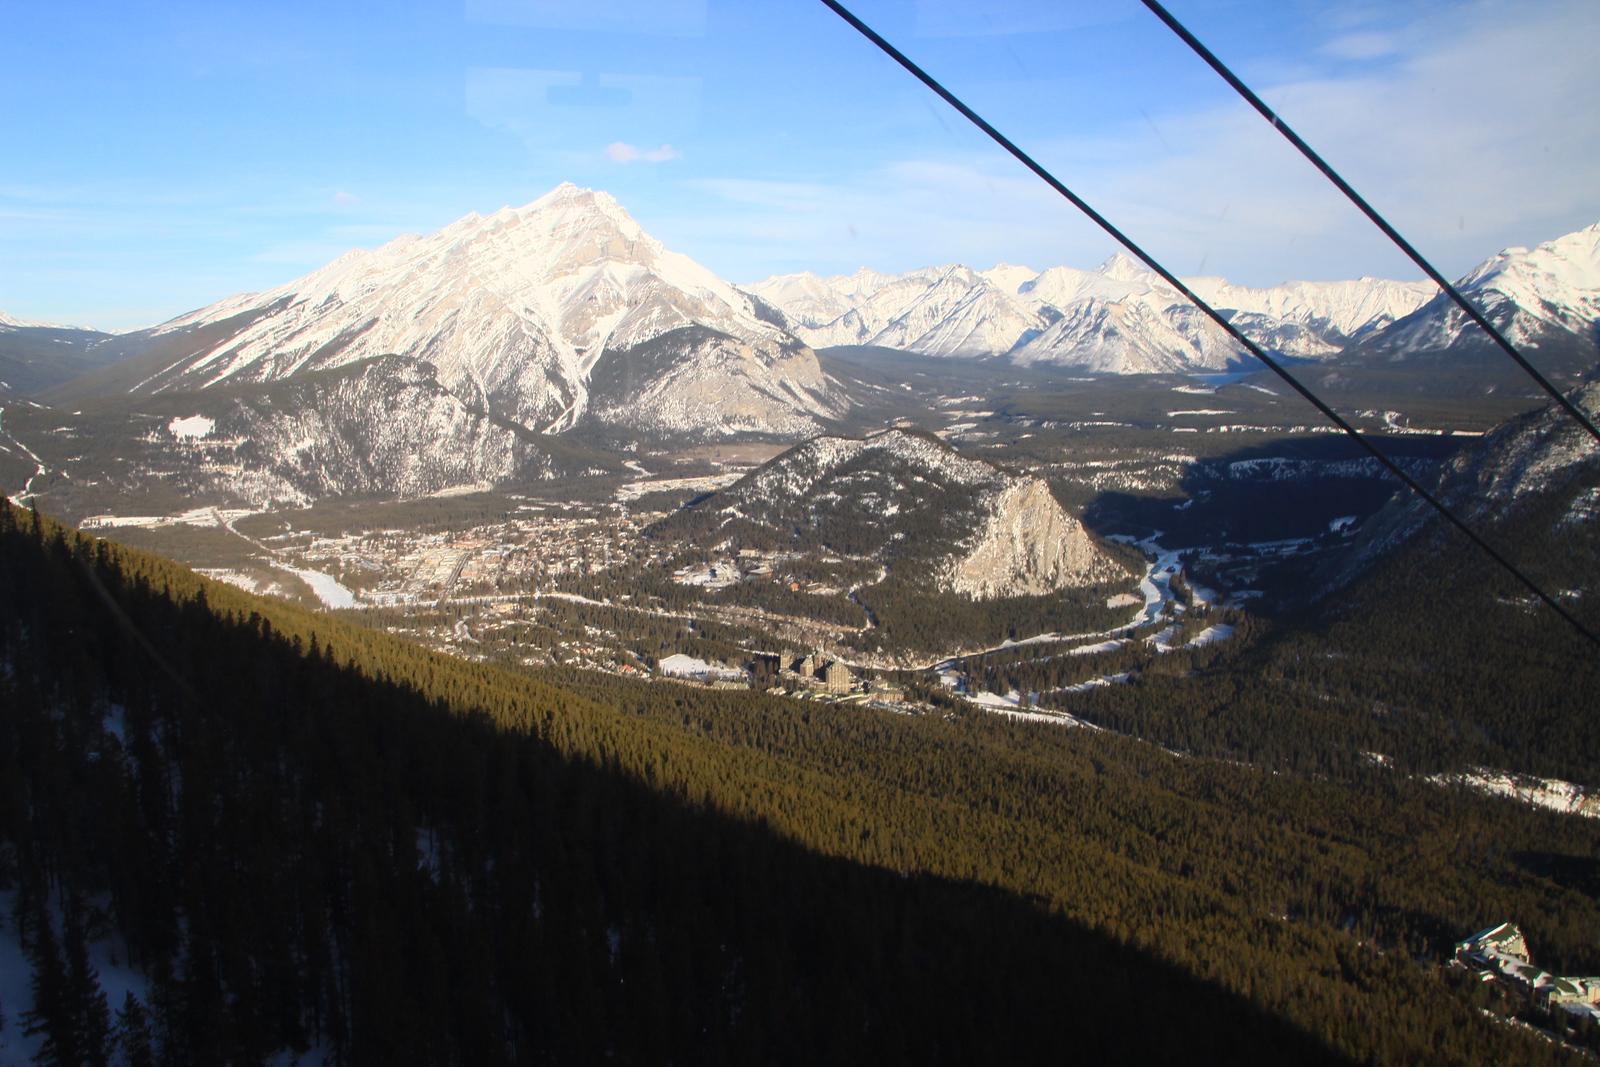 98. Banff National Park  Hillman Wonders Page<br> http://www.hillmanwonders.com/banff/banff.htm  Banff and Lake Louise Galleries<br> http://www.rishisankar.com/Travel/Canada/Sulphur-Mountain-Gondola-2012/20874072_LNLxNV<br>  http://www.rishisankar.com/Travel/Canada/Banff/20845804_68RztM